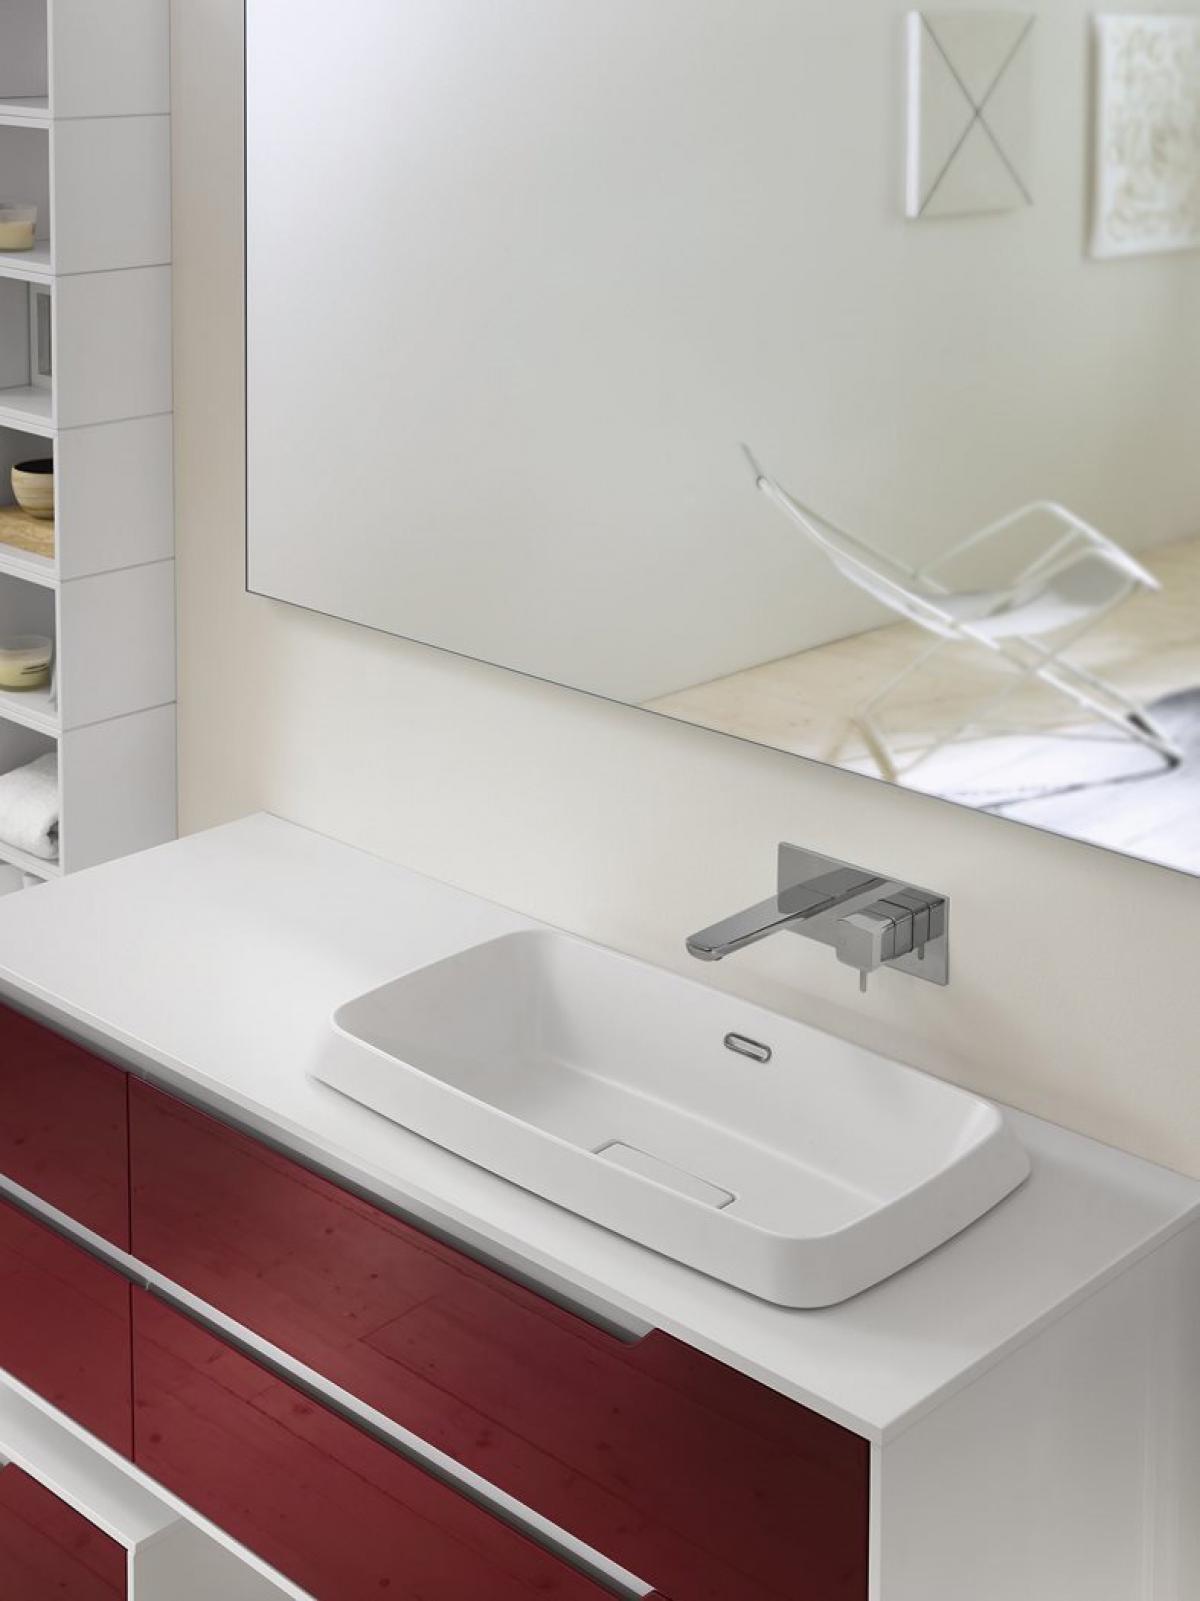 Meubles et table vasque prestige inda induscabel for Inda salle de bain